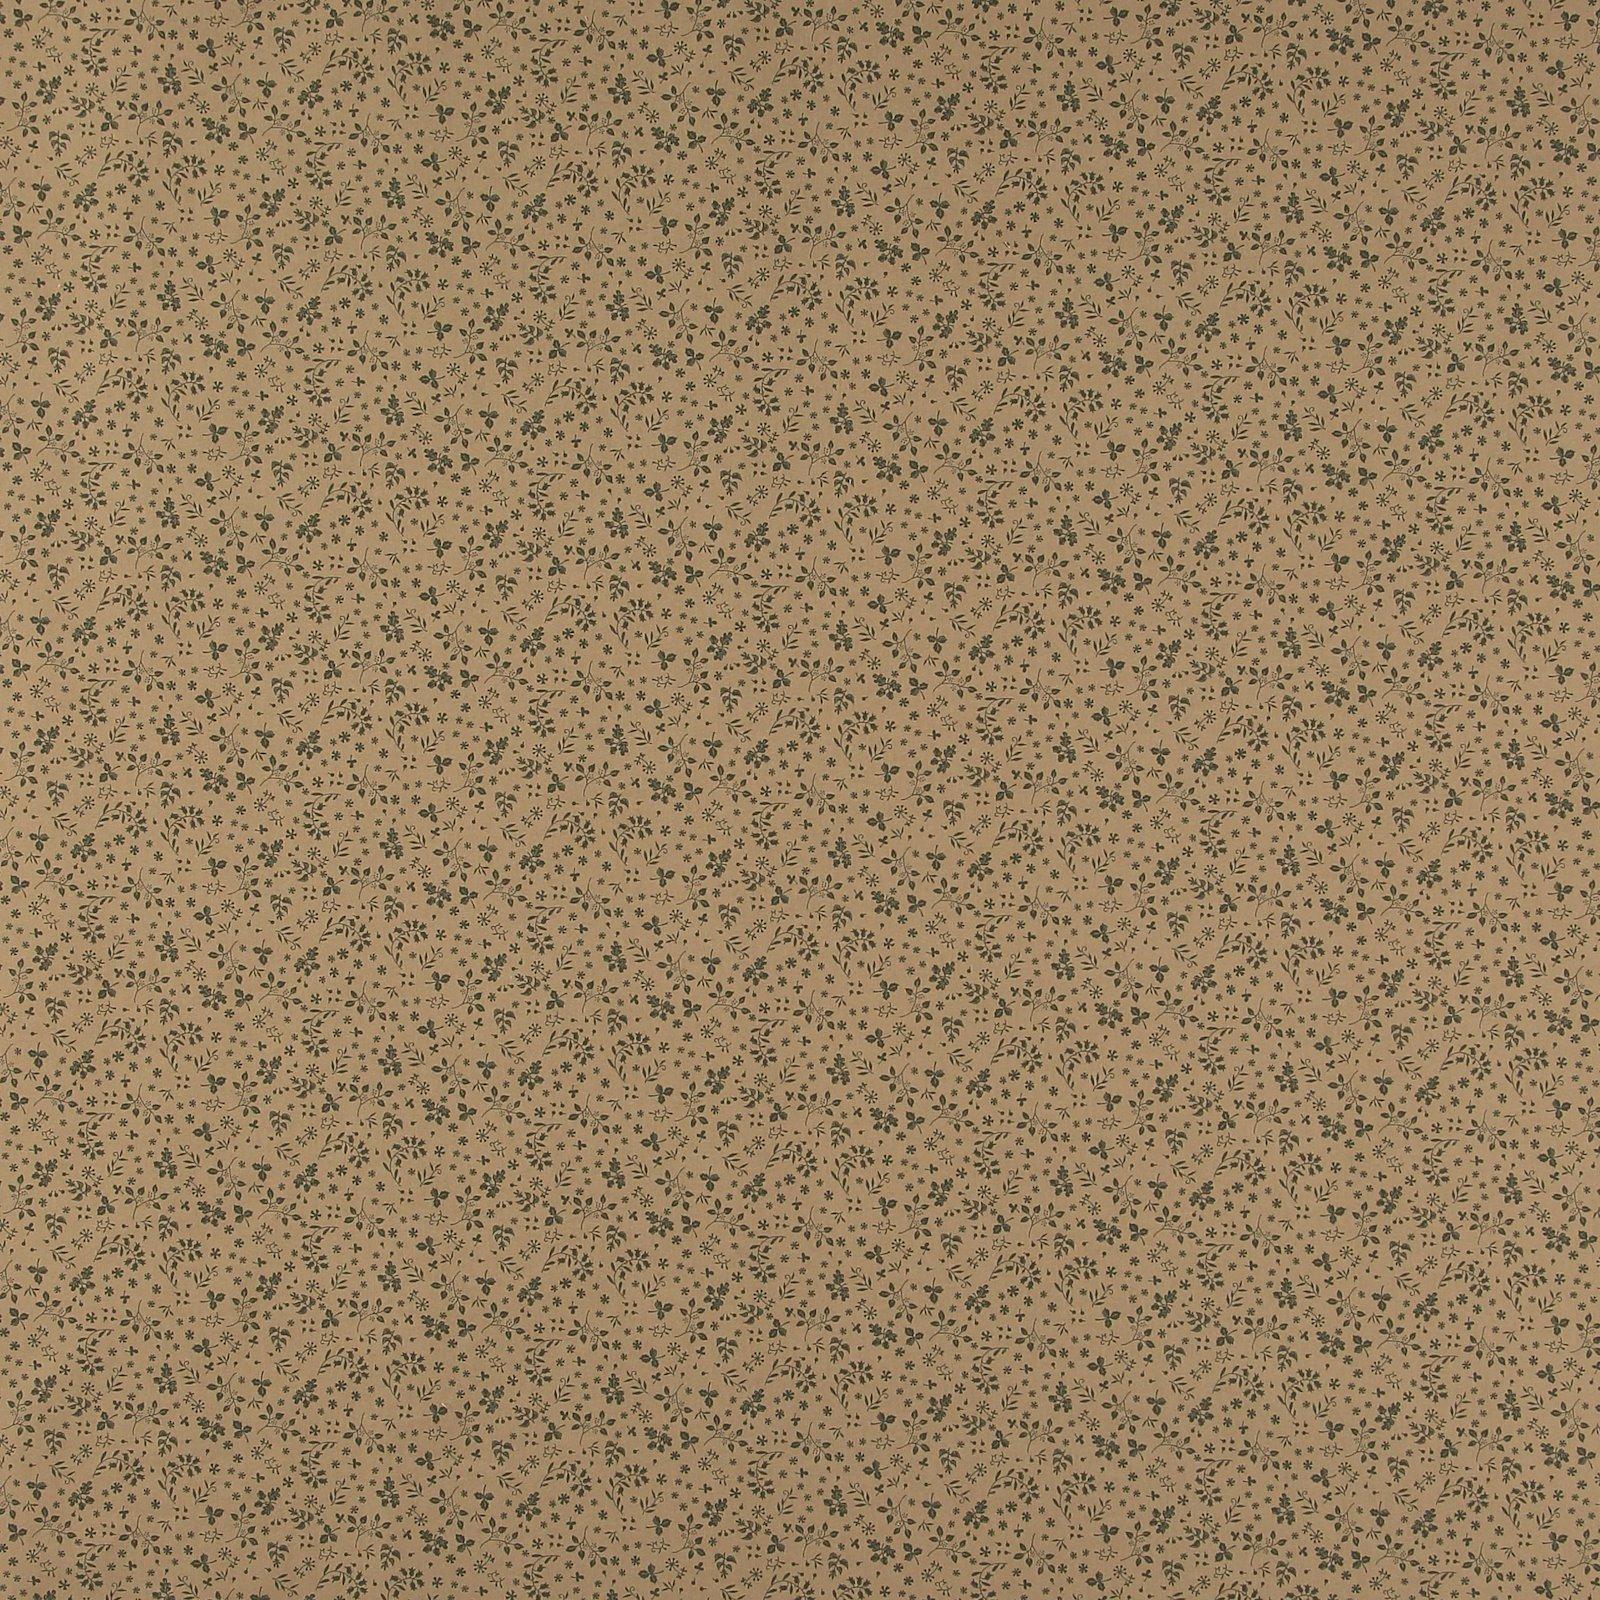 Cotton dark beige w army green leaves 852400_pack_sp